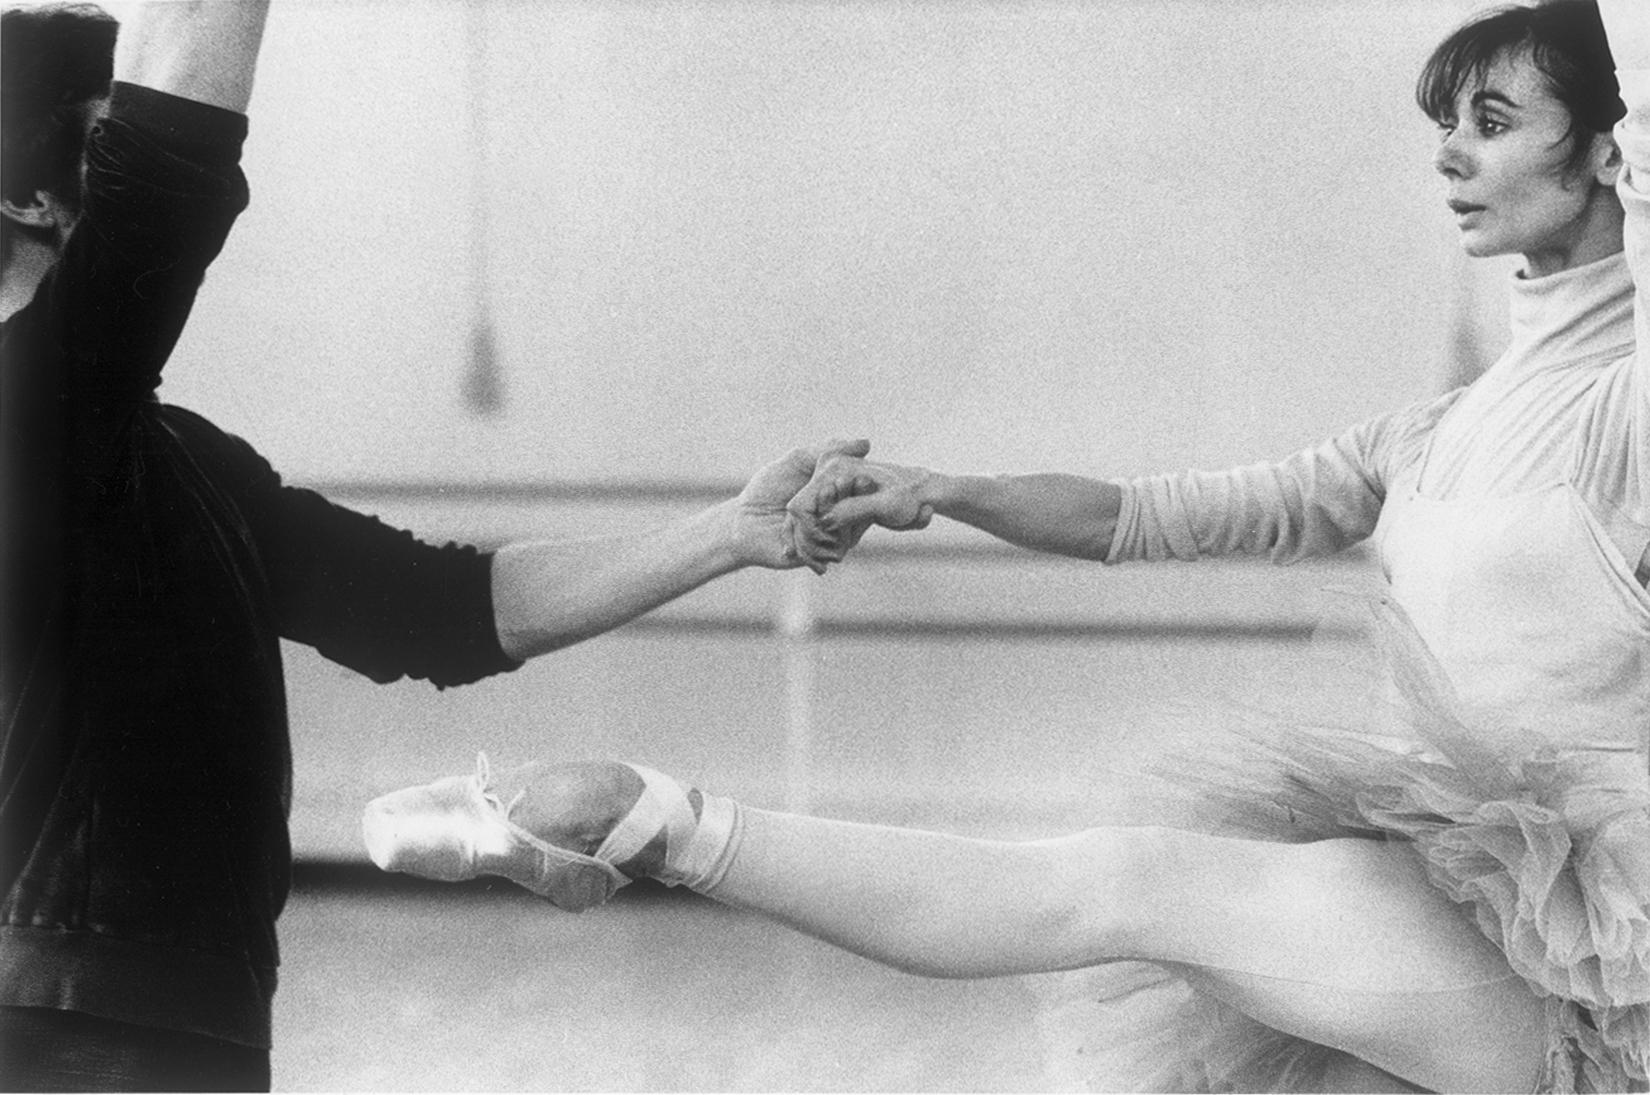 Marguerite Porter & David Wall